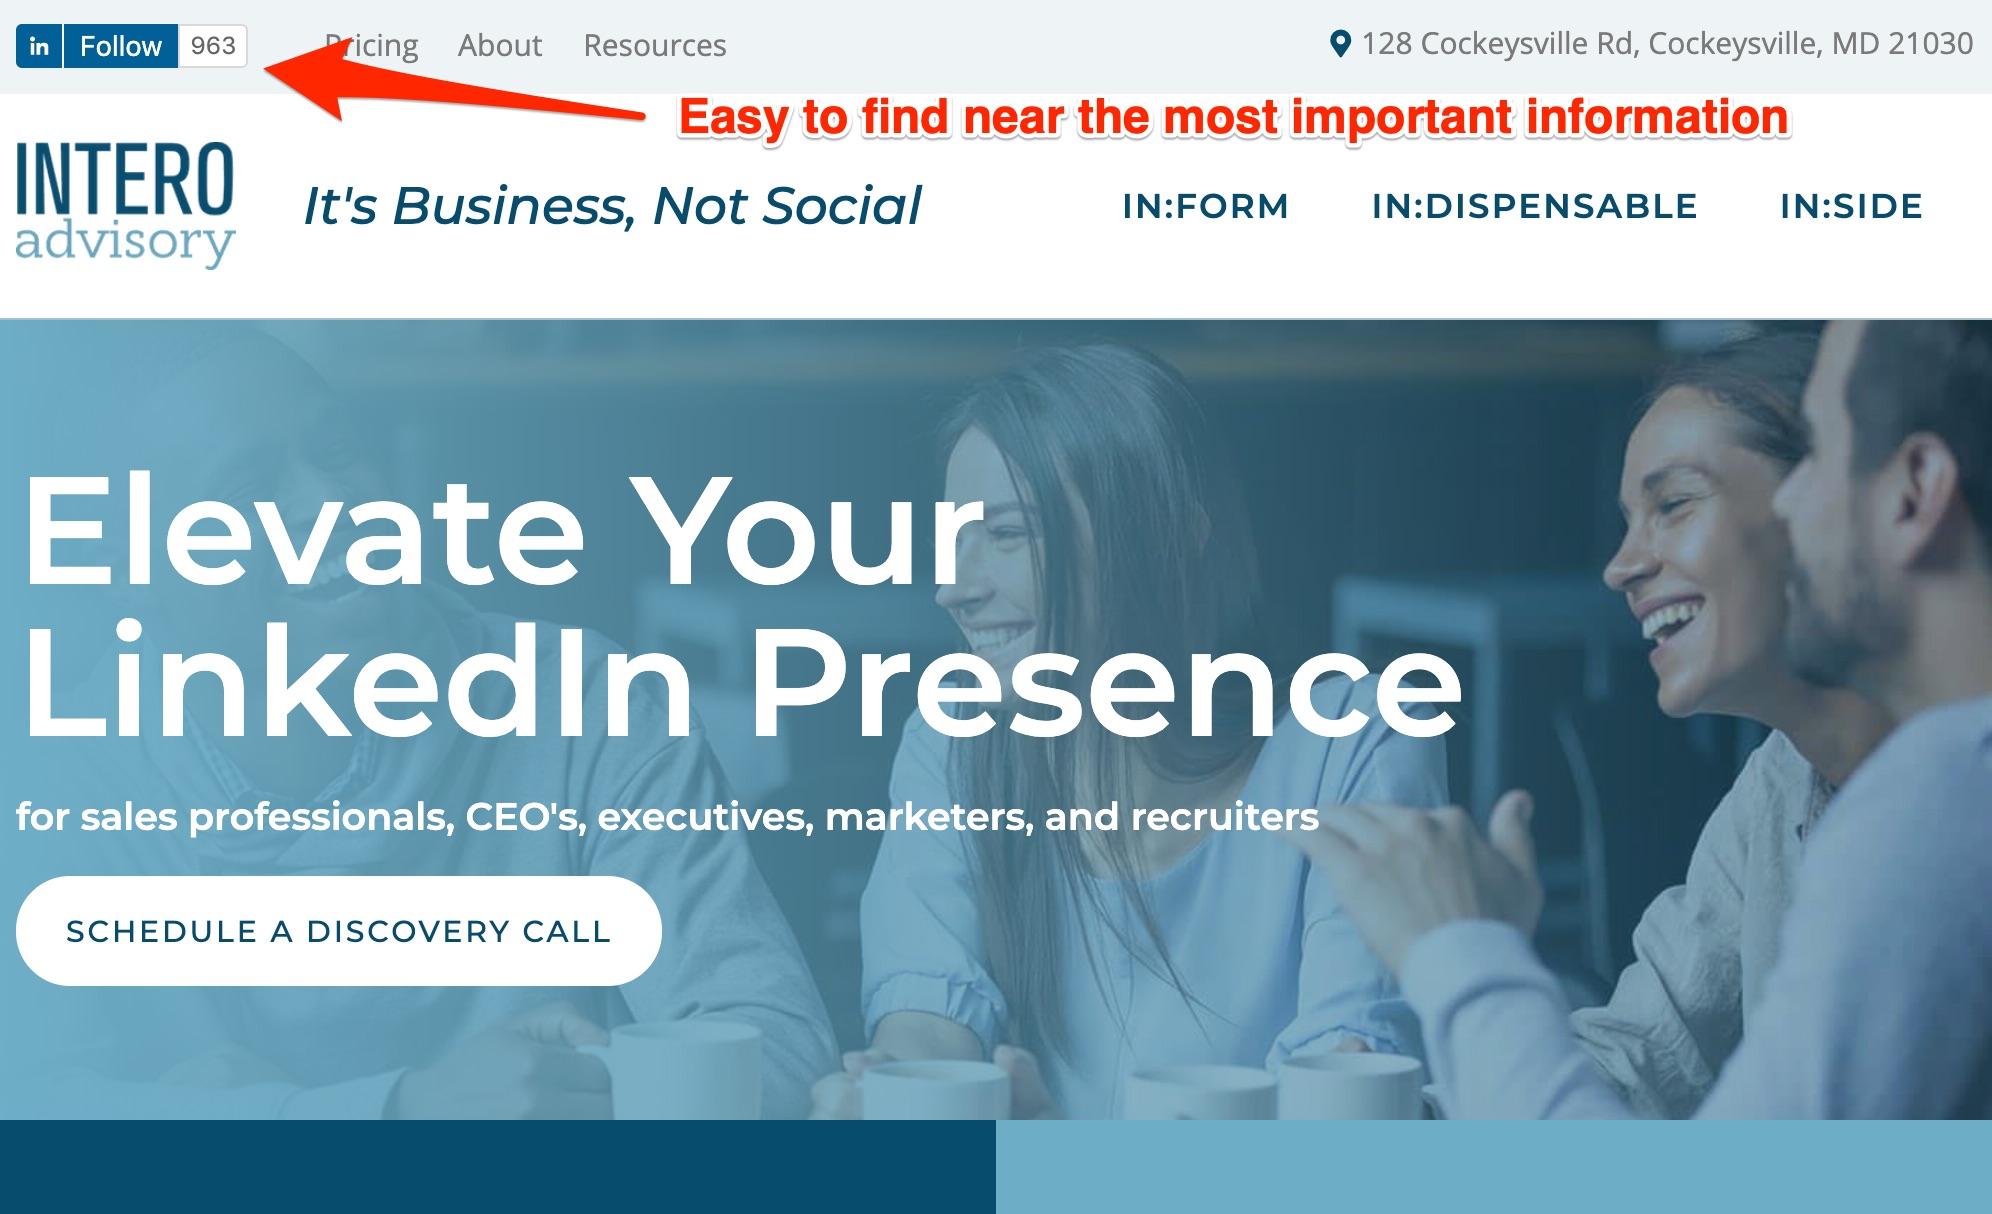 7.14.20 Intero Company Page Follow Button